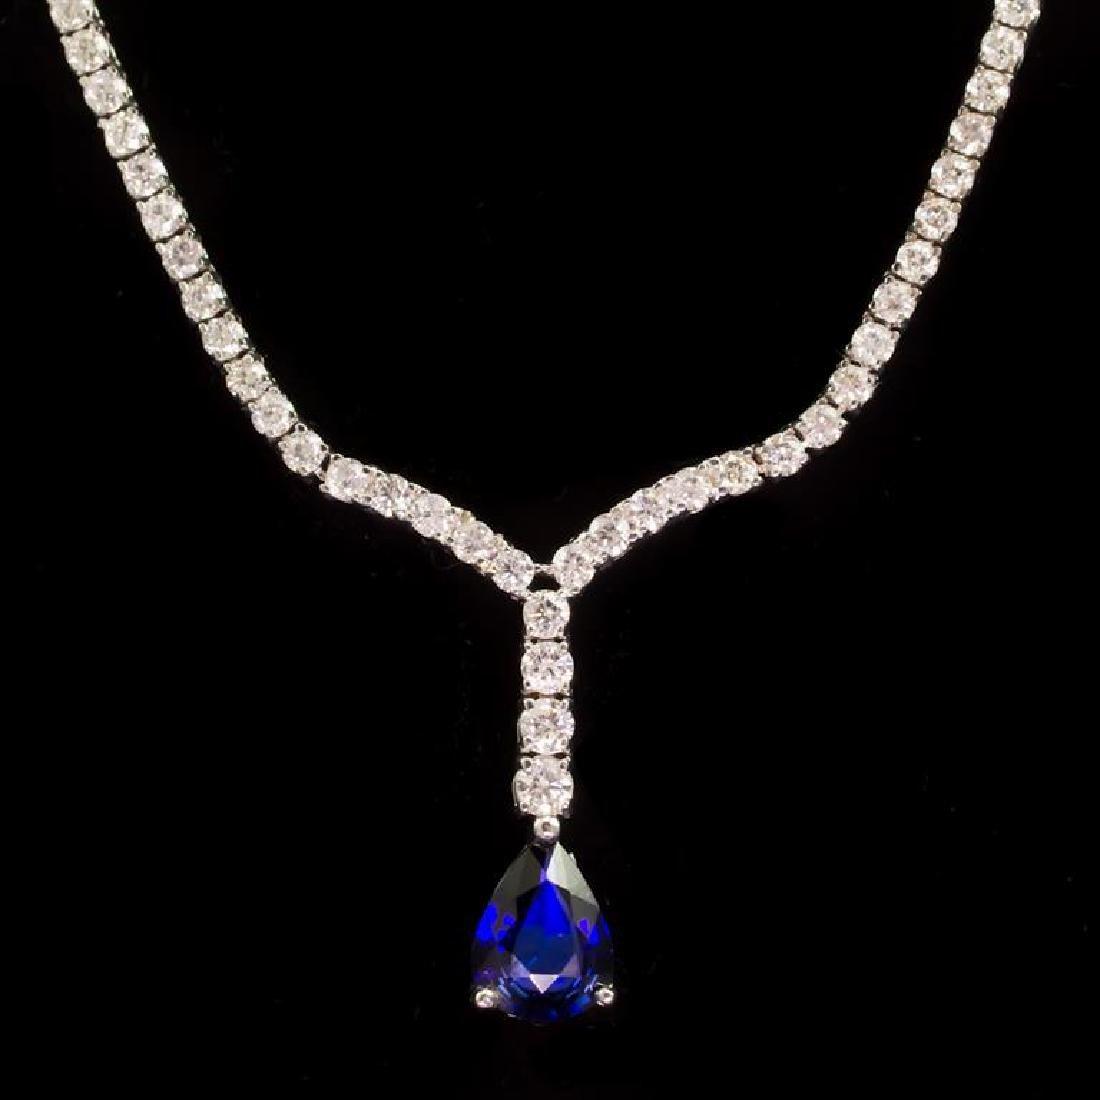 18k Gold 1.61ct Sapphire 4.20ct Diamond Necklace